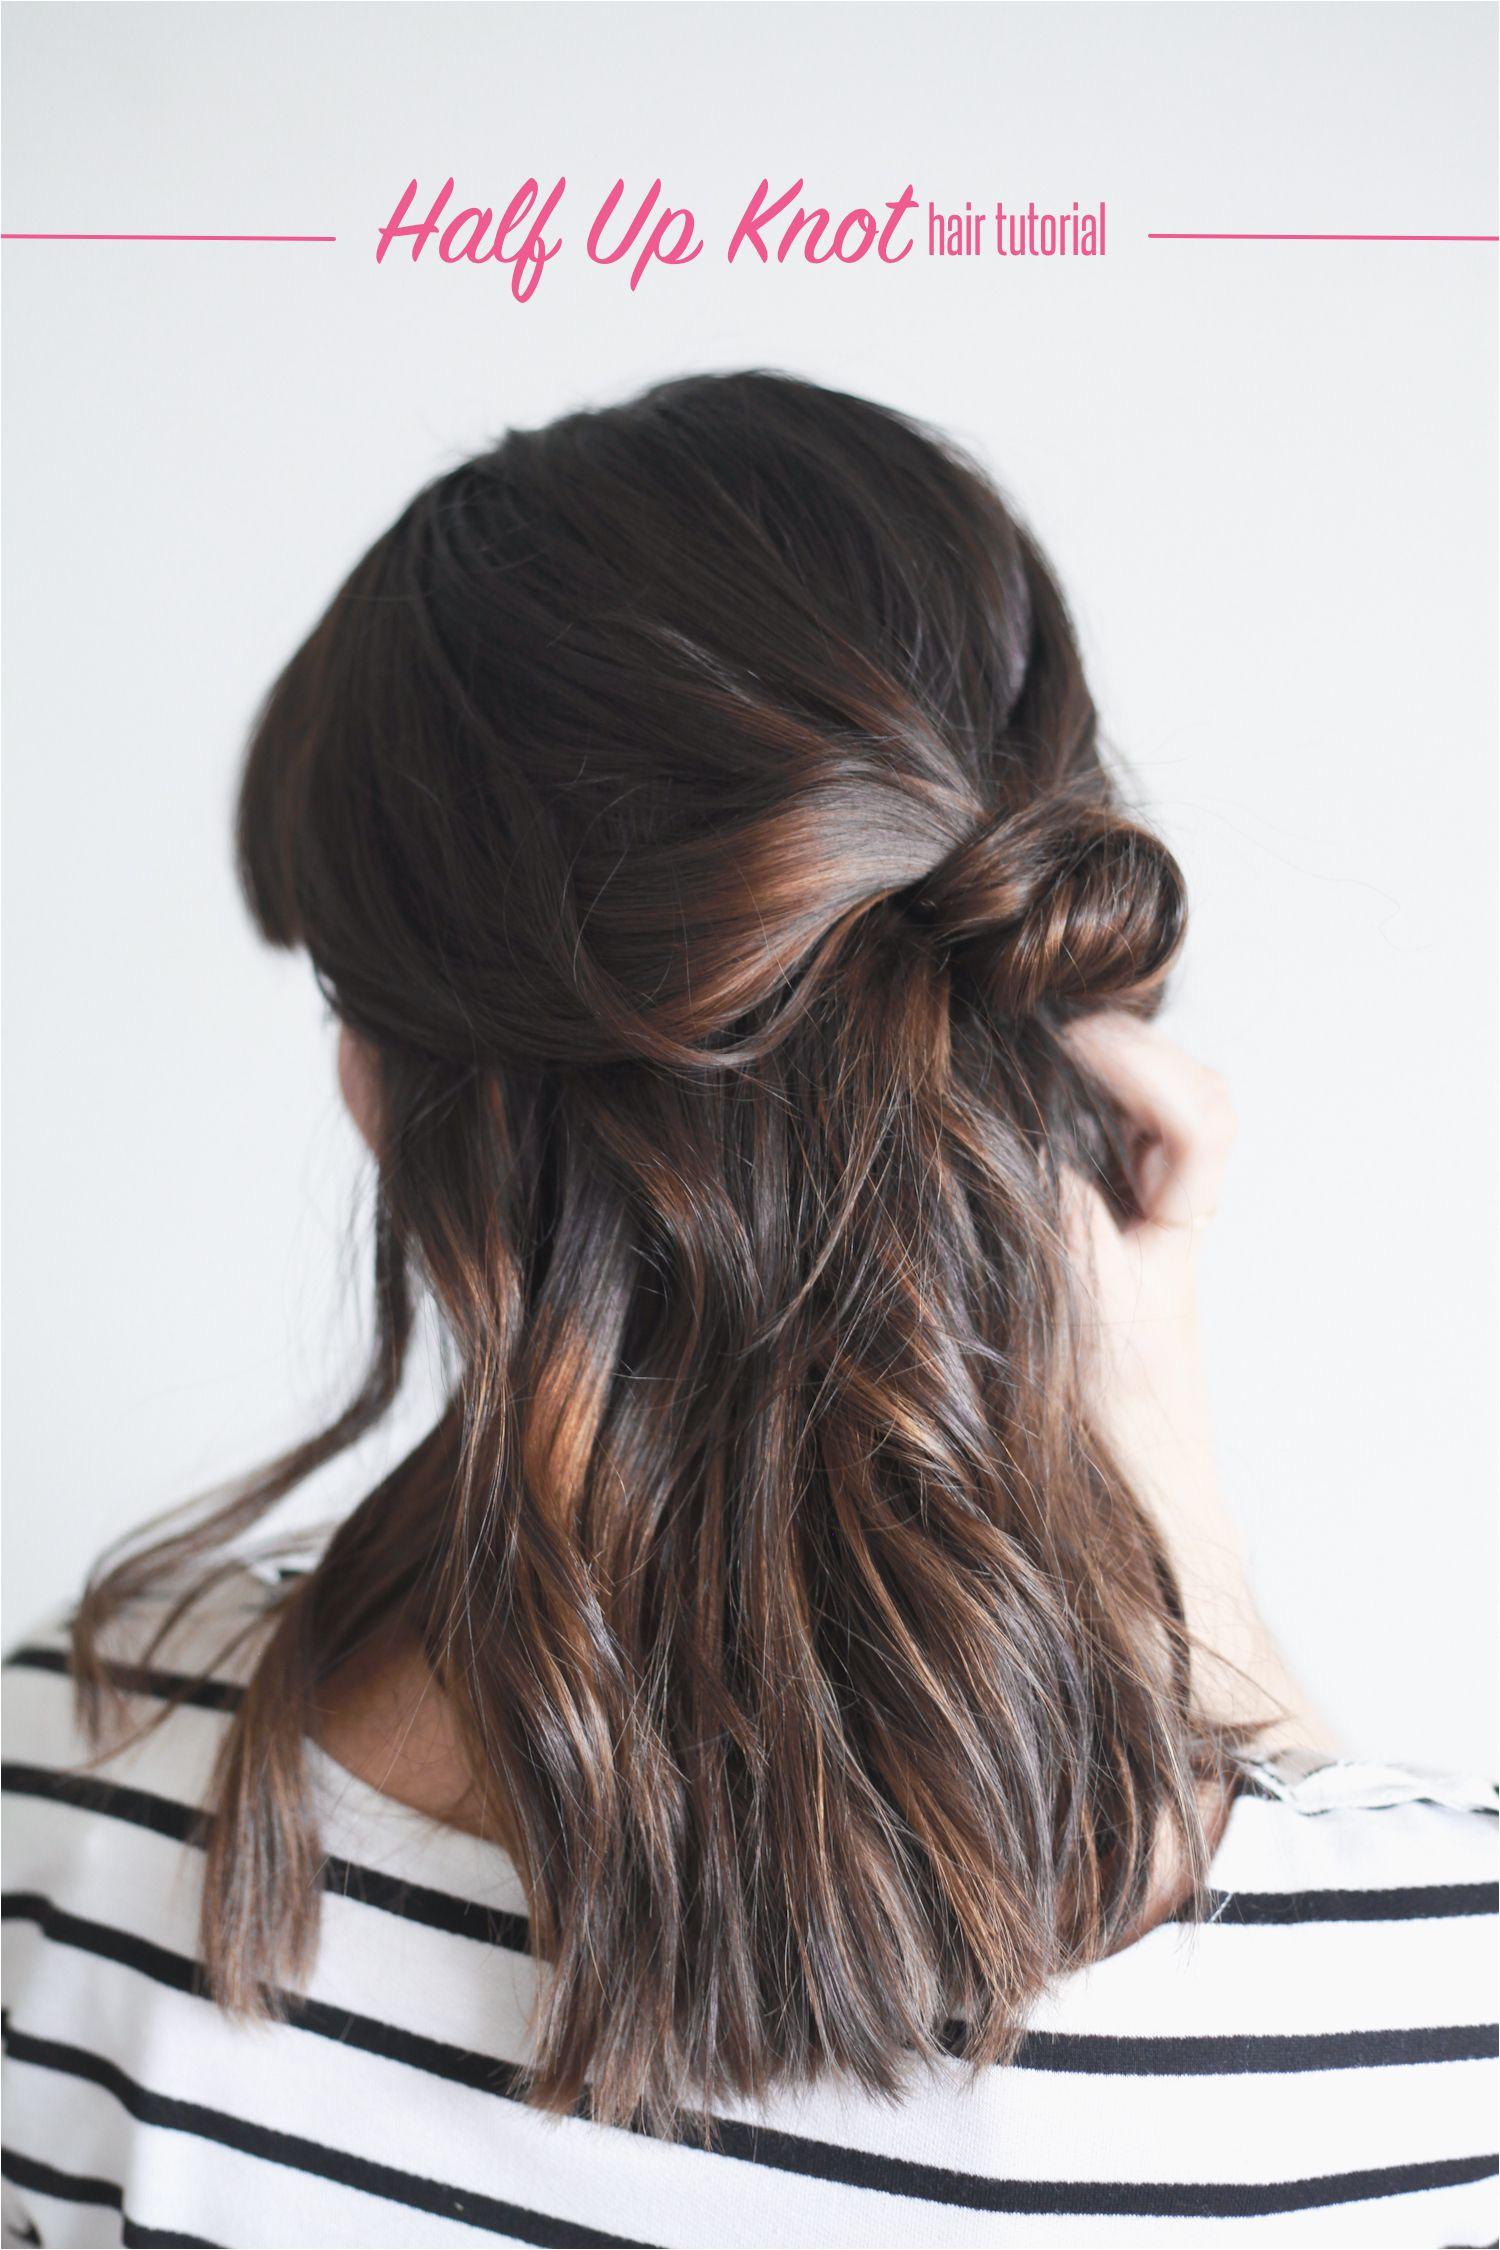 Hair Tutorial Half Up Knot — Treasures & Travels